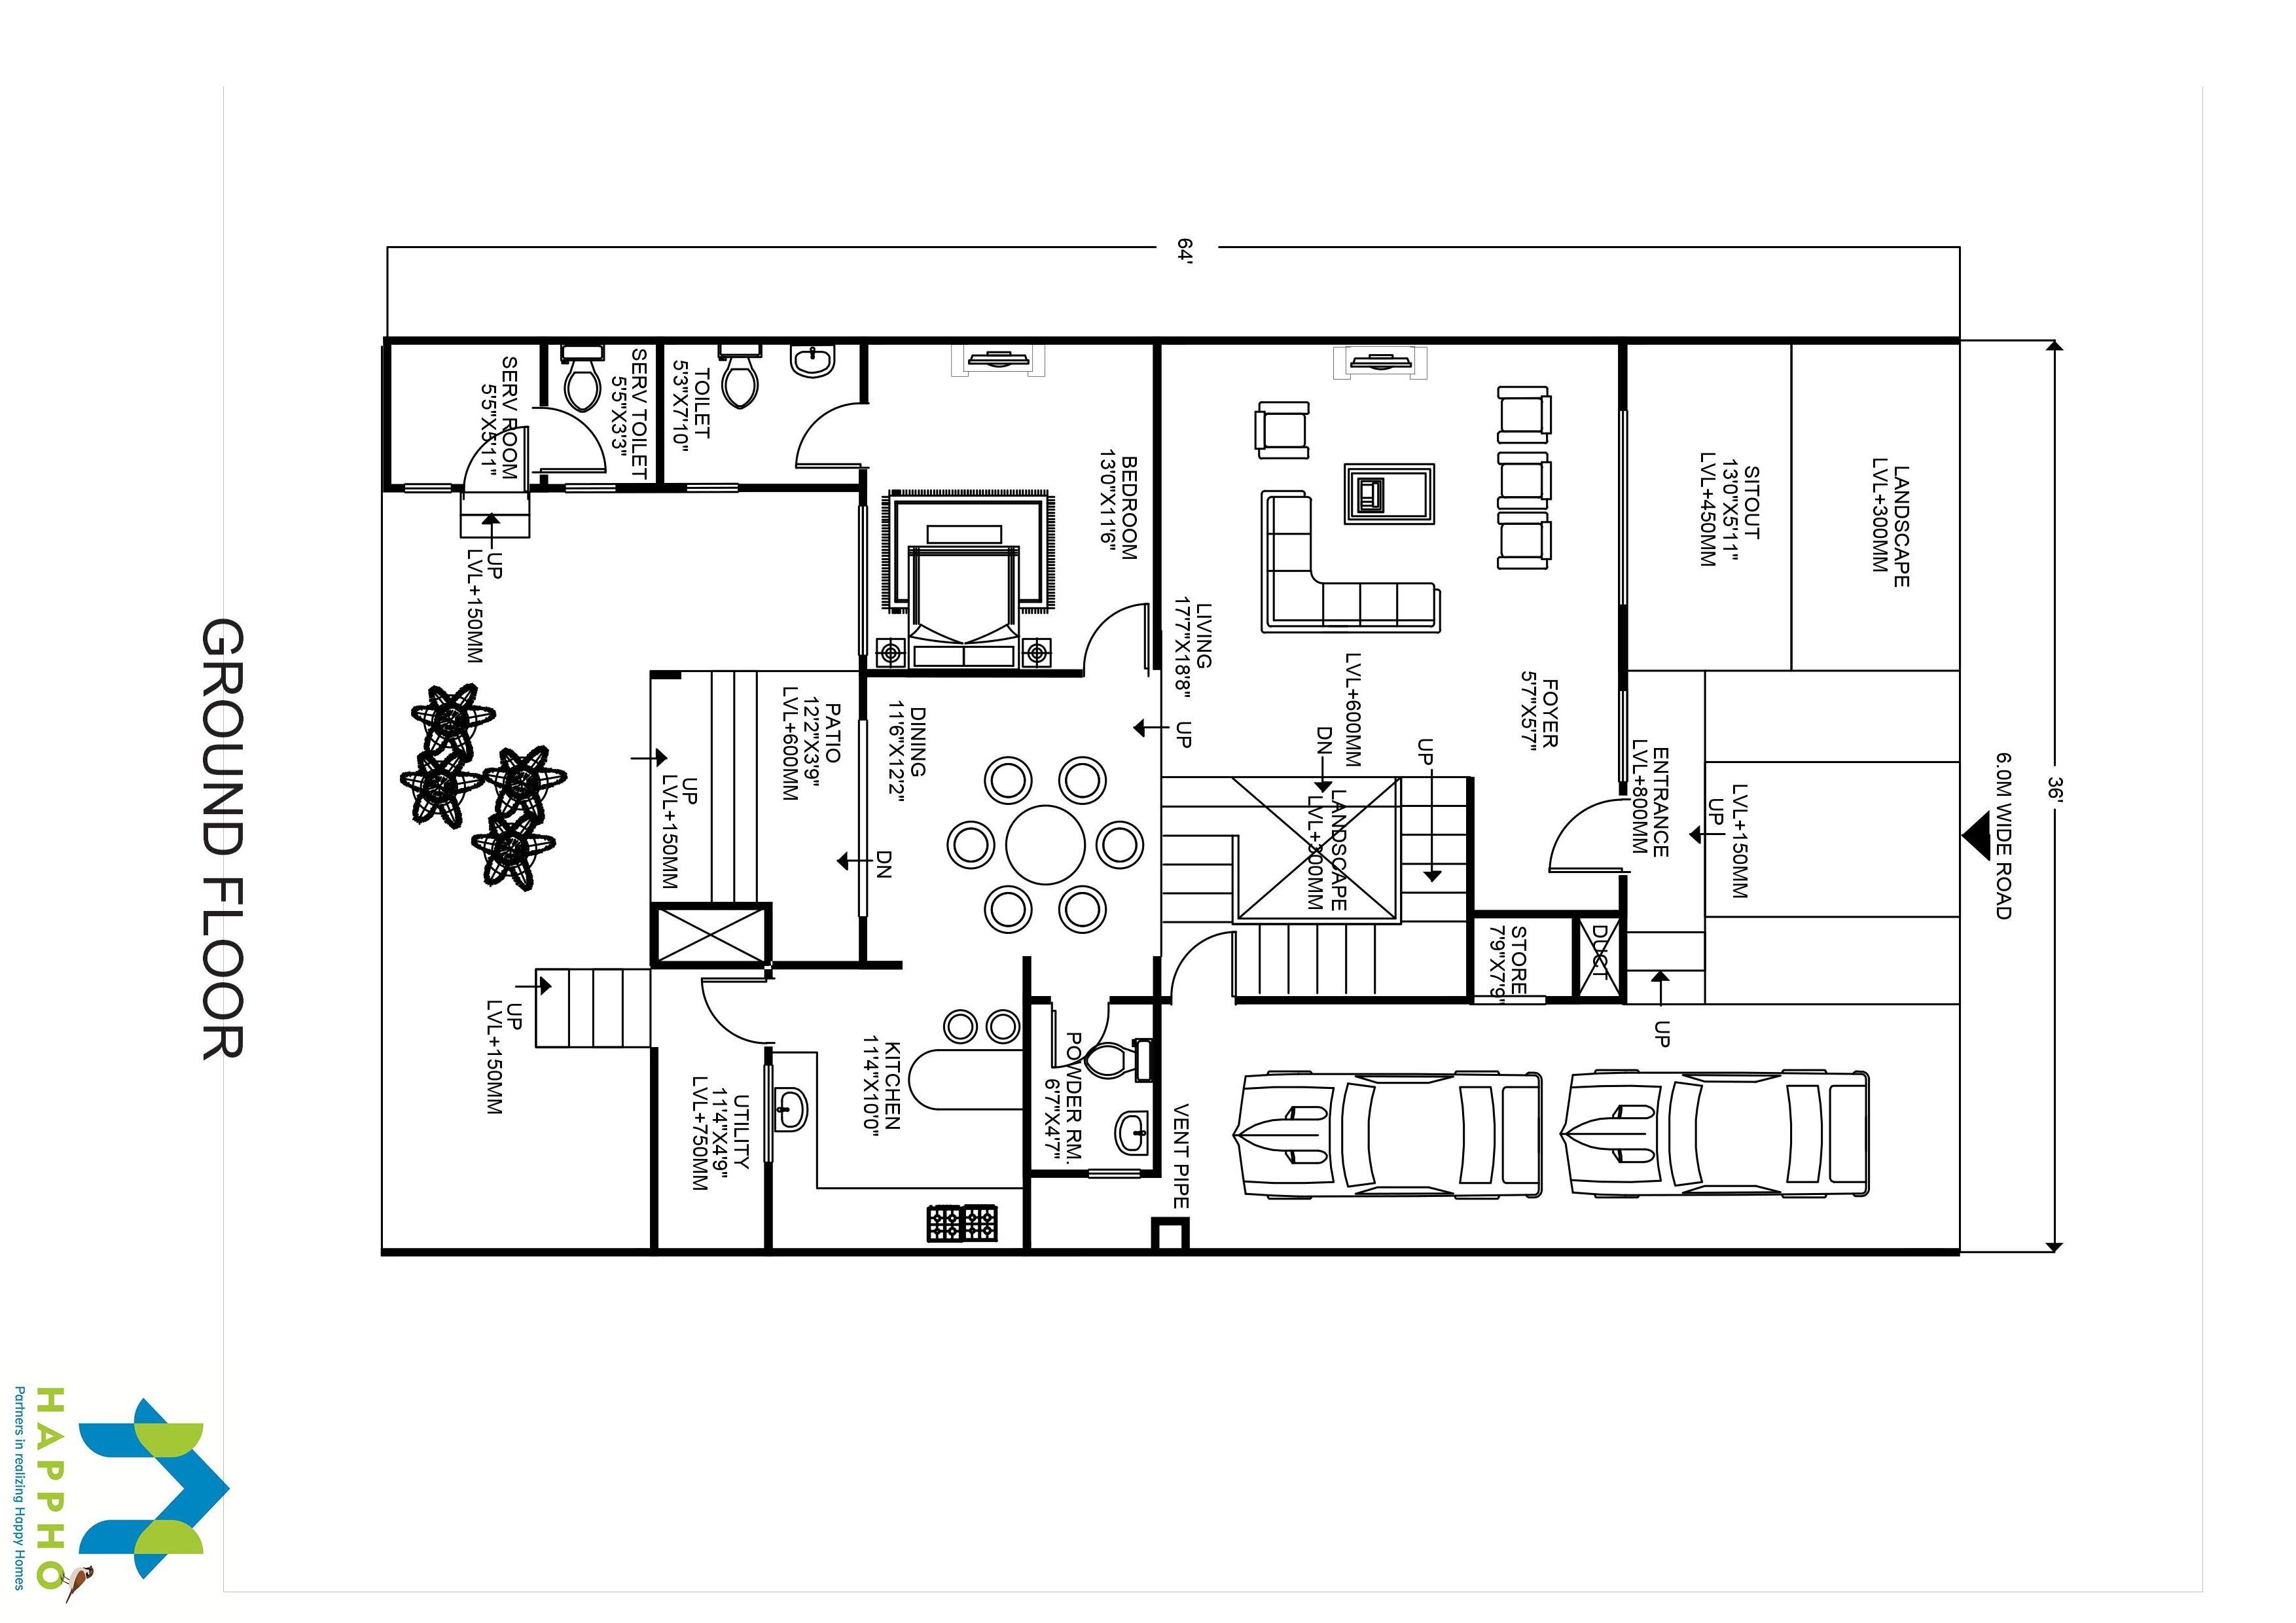 3 bhk floor plan for 65 x 40 plot 2600 square feet 289 for 2600 sq ft house plans